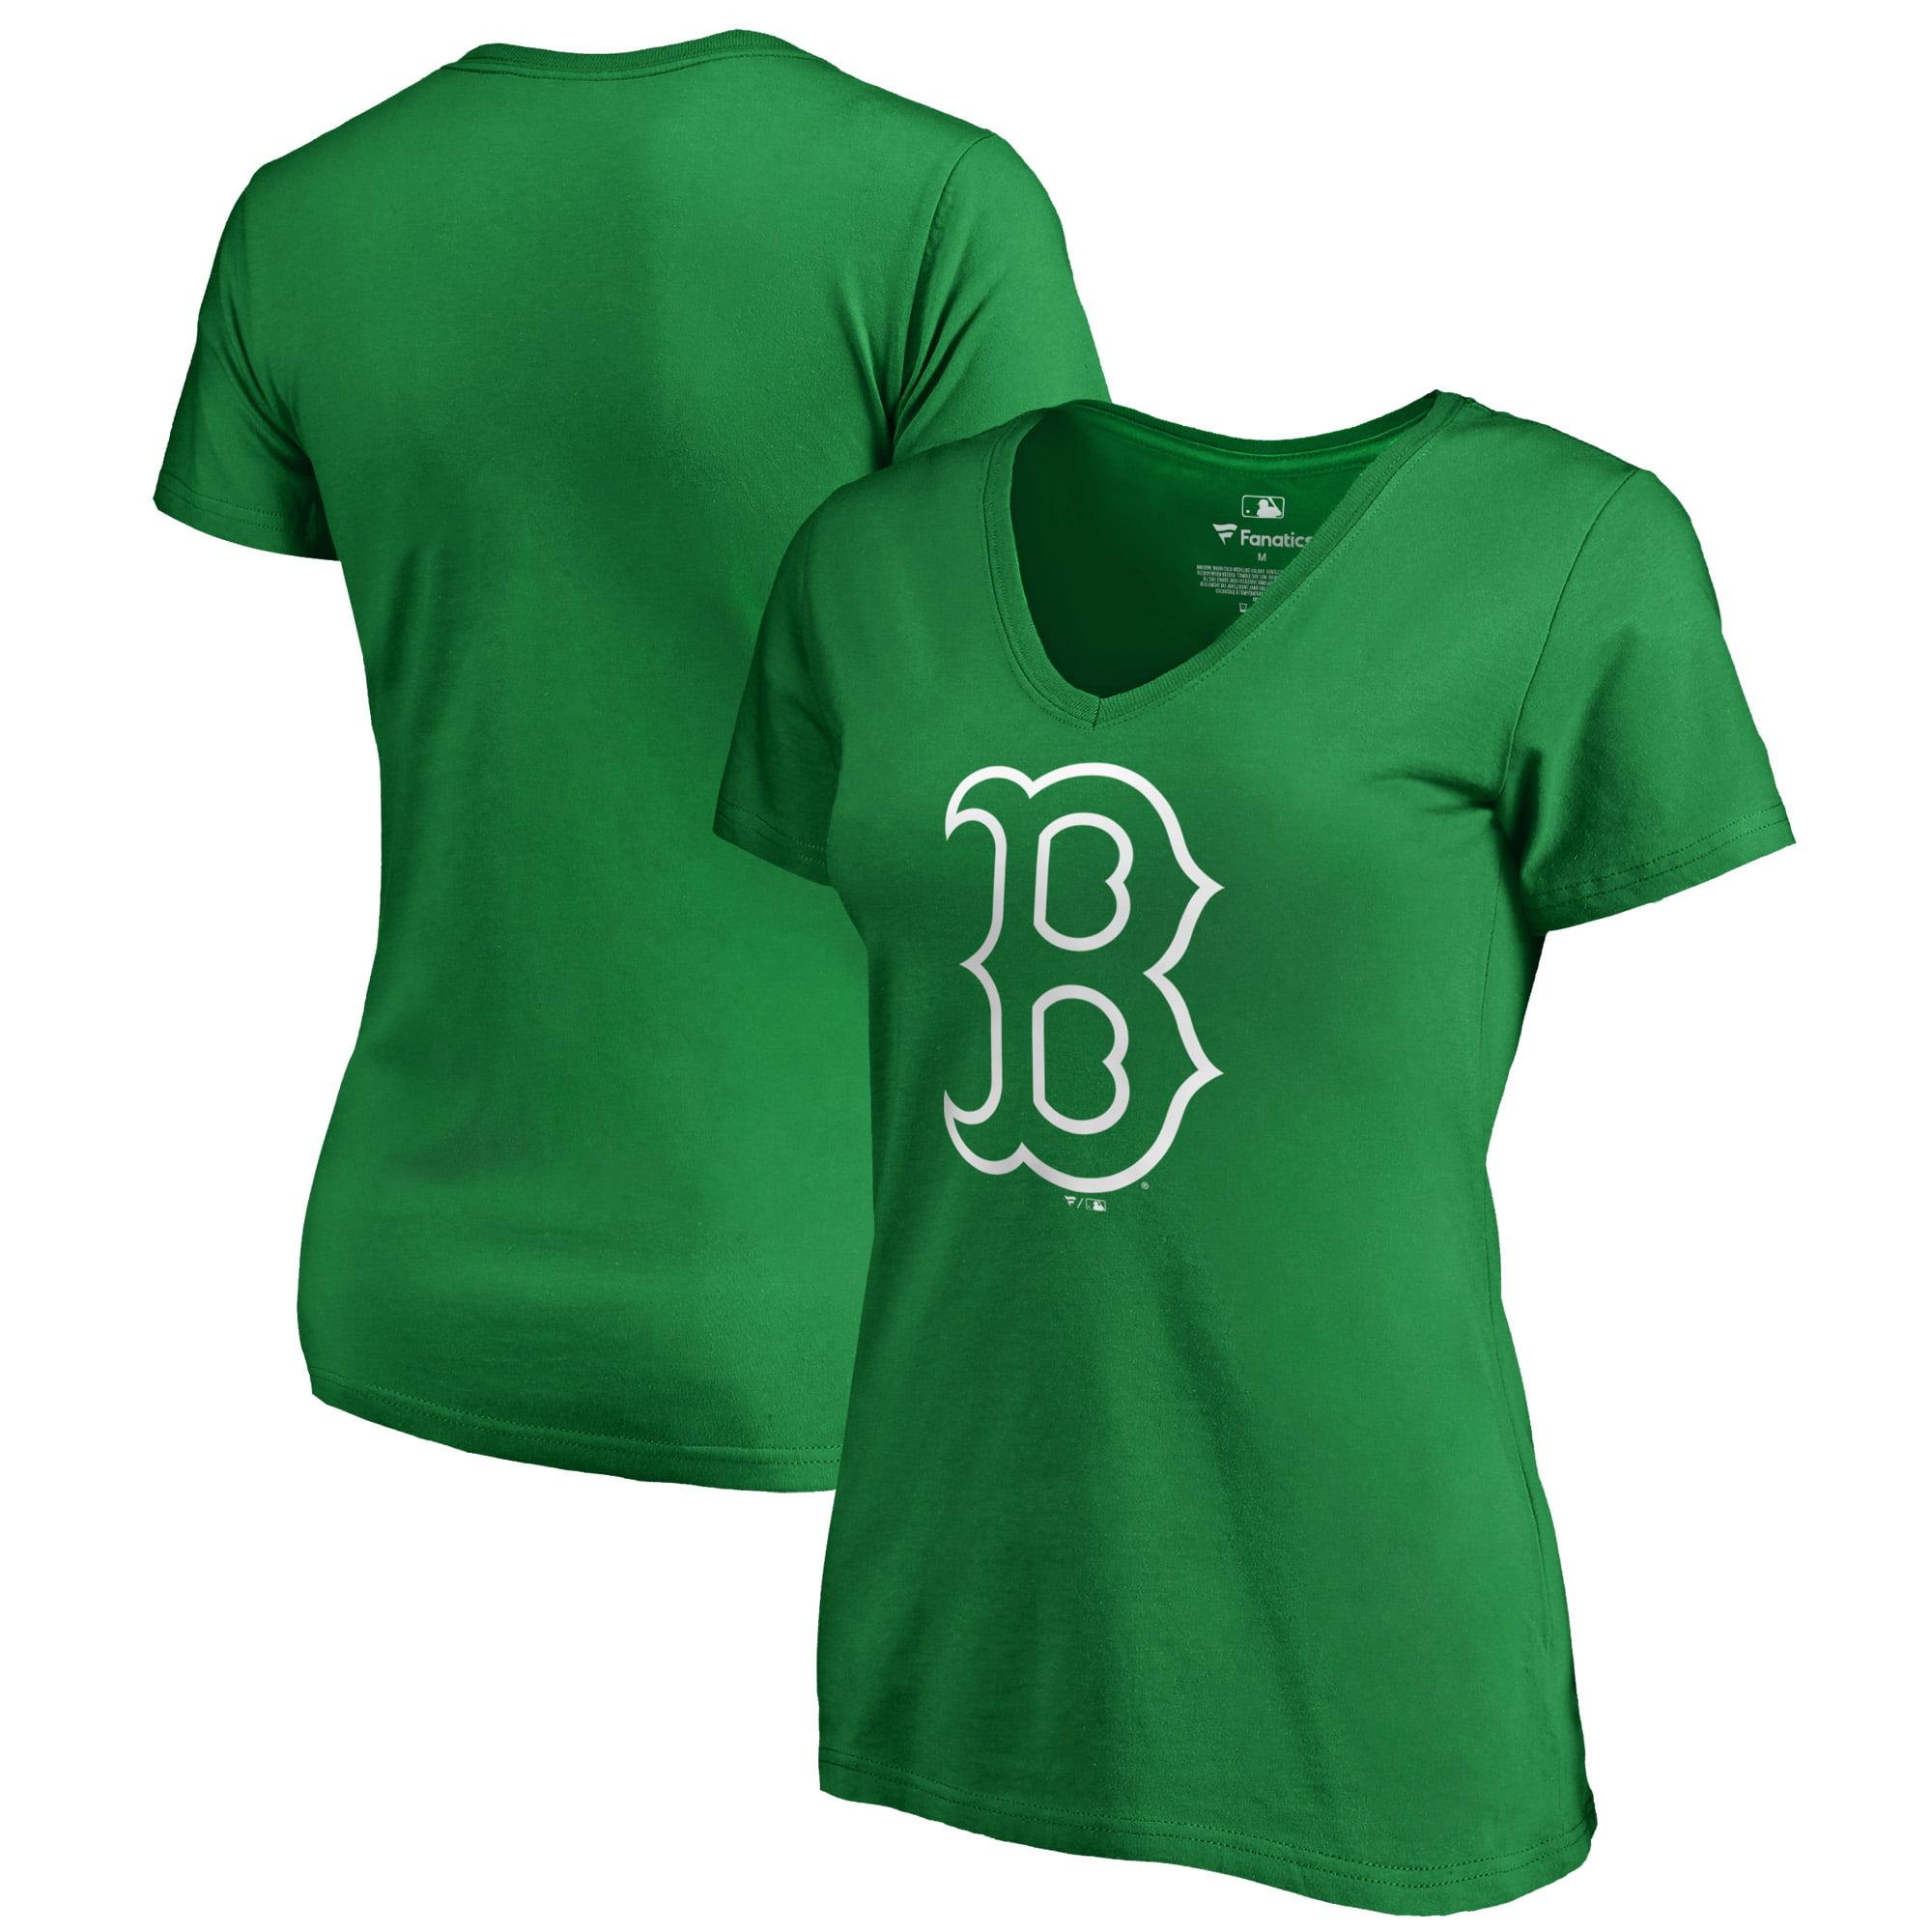 Boston Red Sox Fanatics Branded Women's St. Patrick's Day White Logo Plus Size V-Neck T-Shirt - Kelly Green